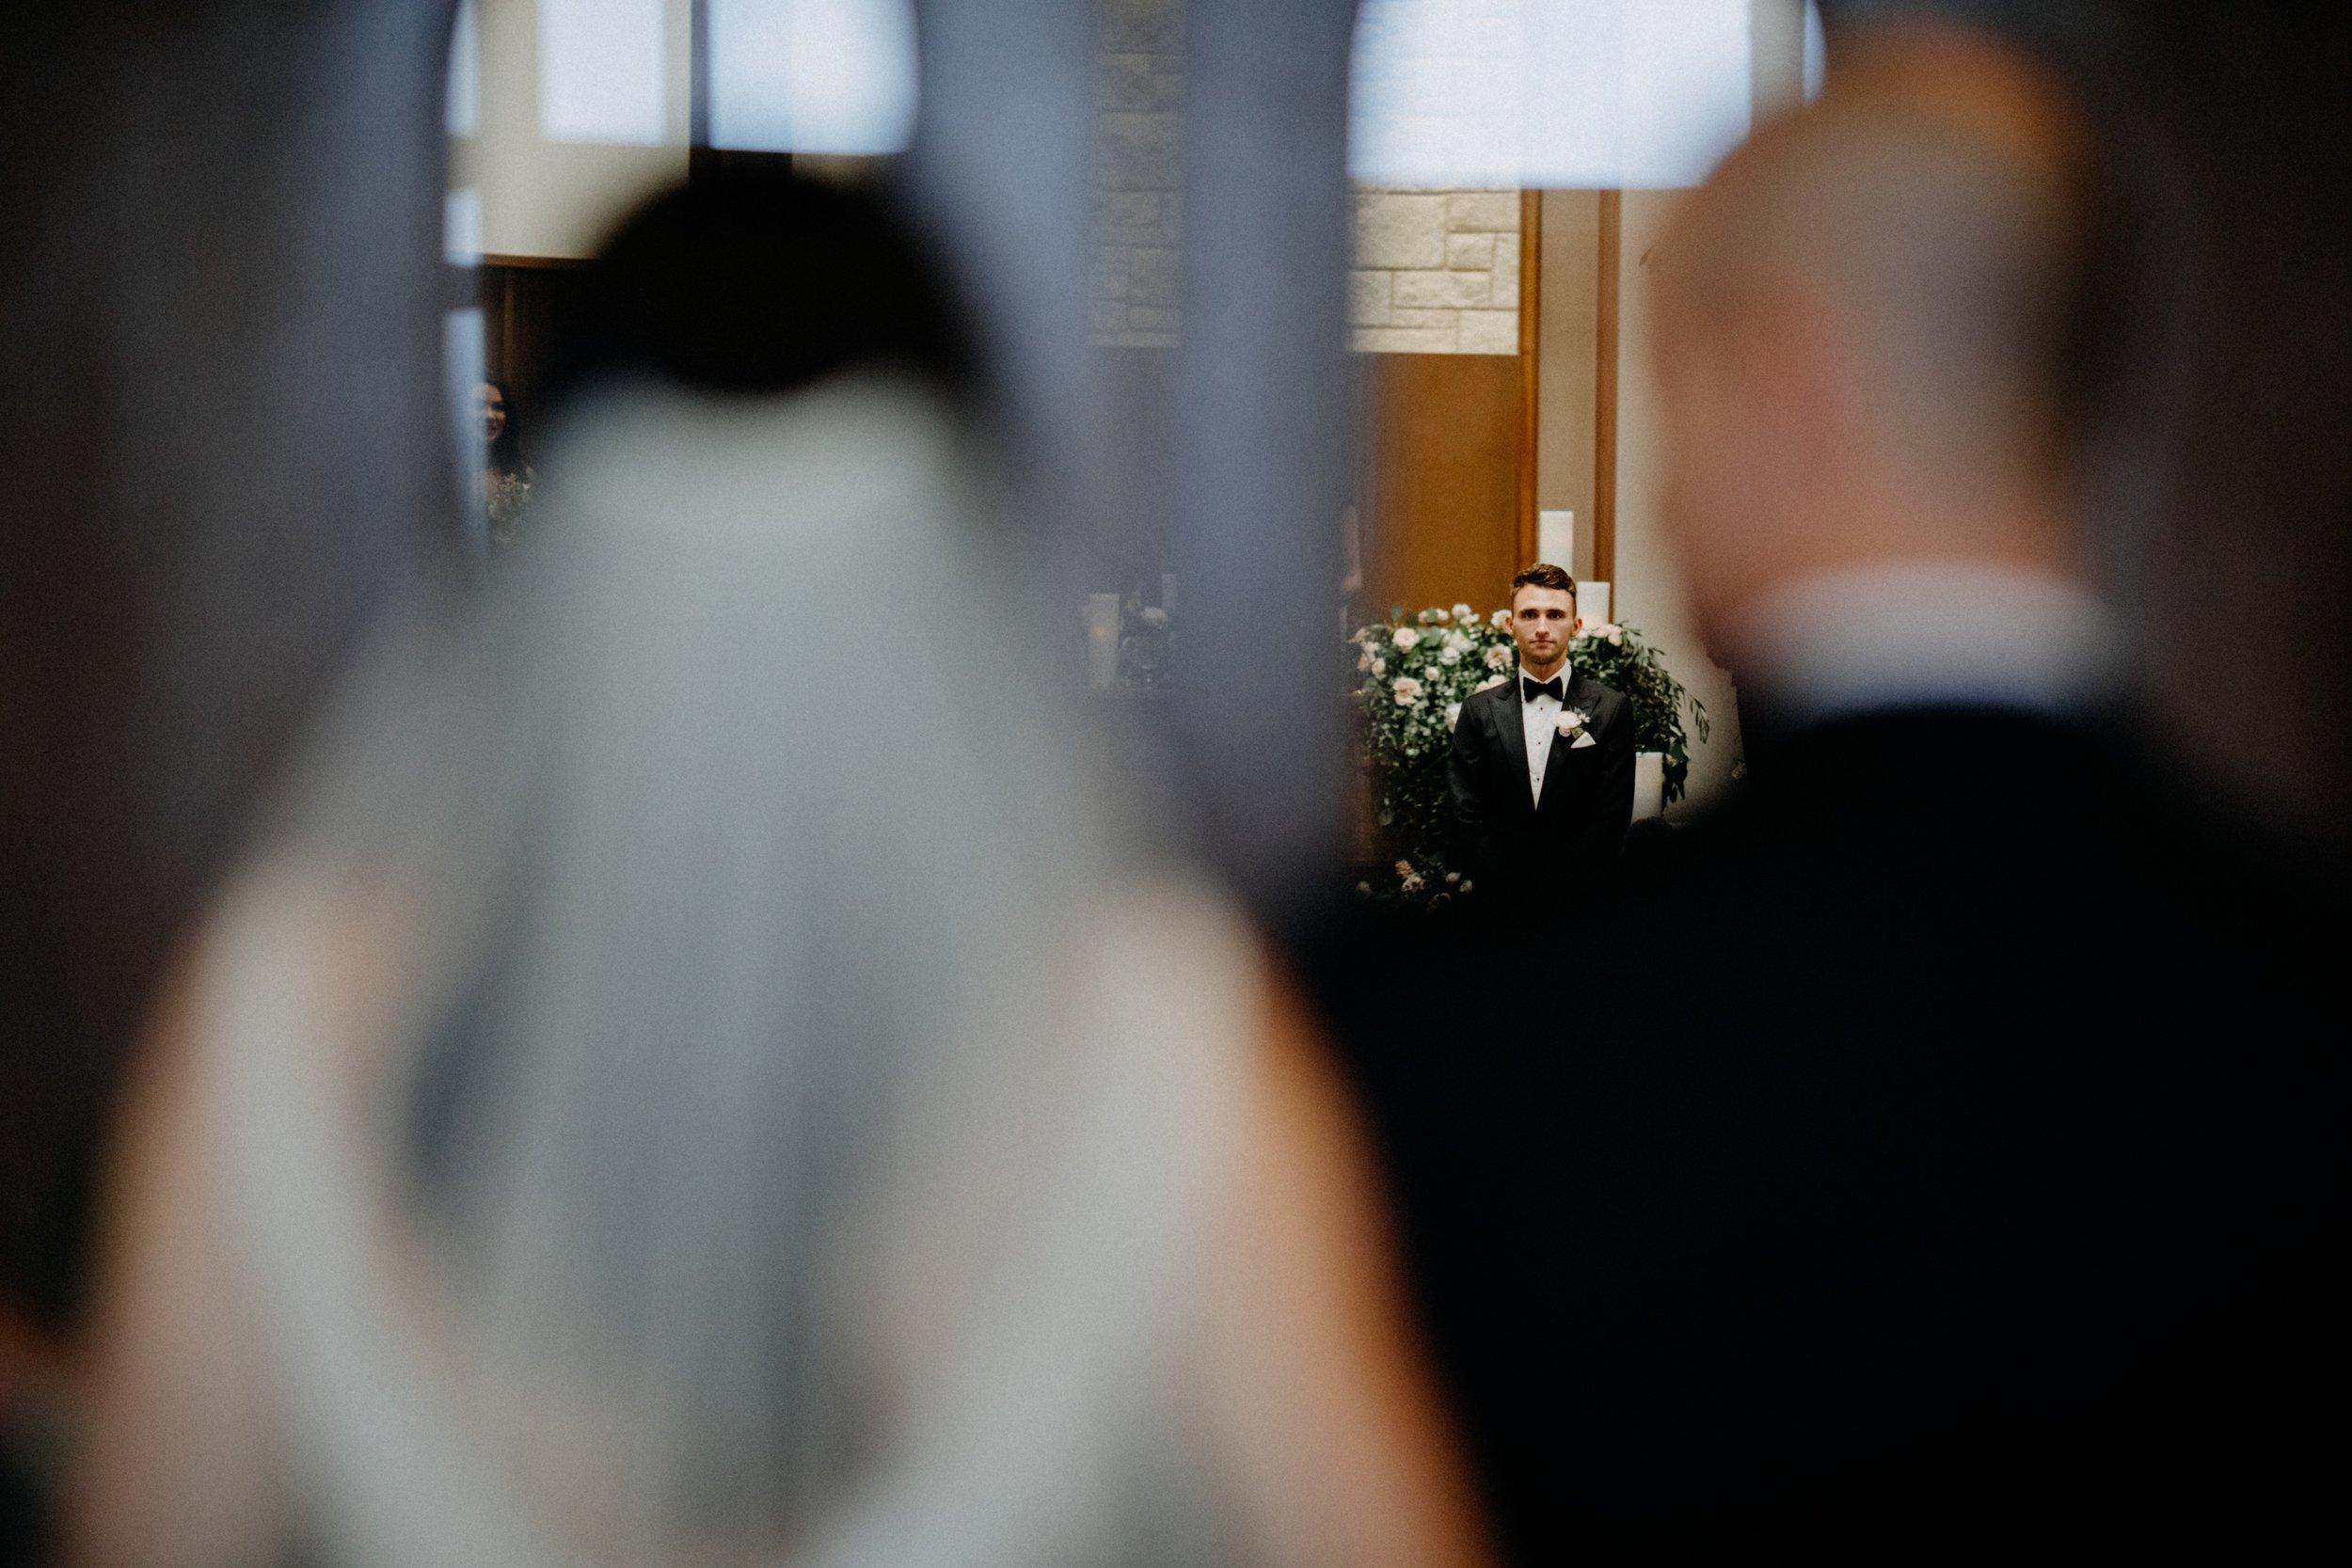 st-anthony-hotel-wedding-photography-10066san-antonio.JPG